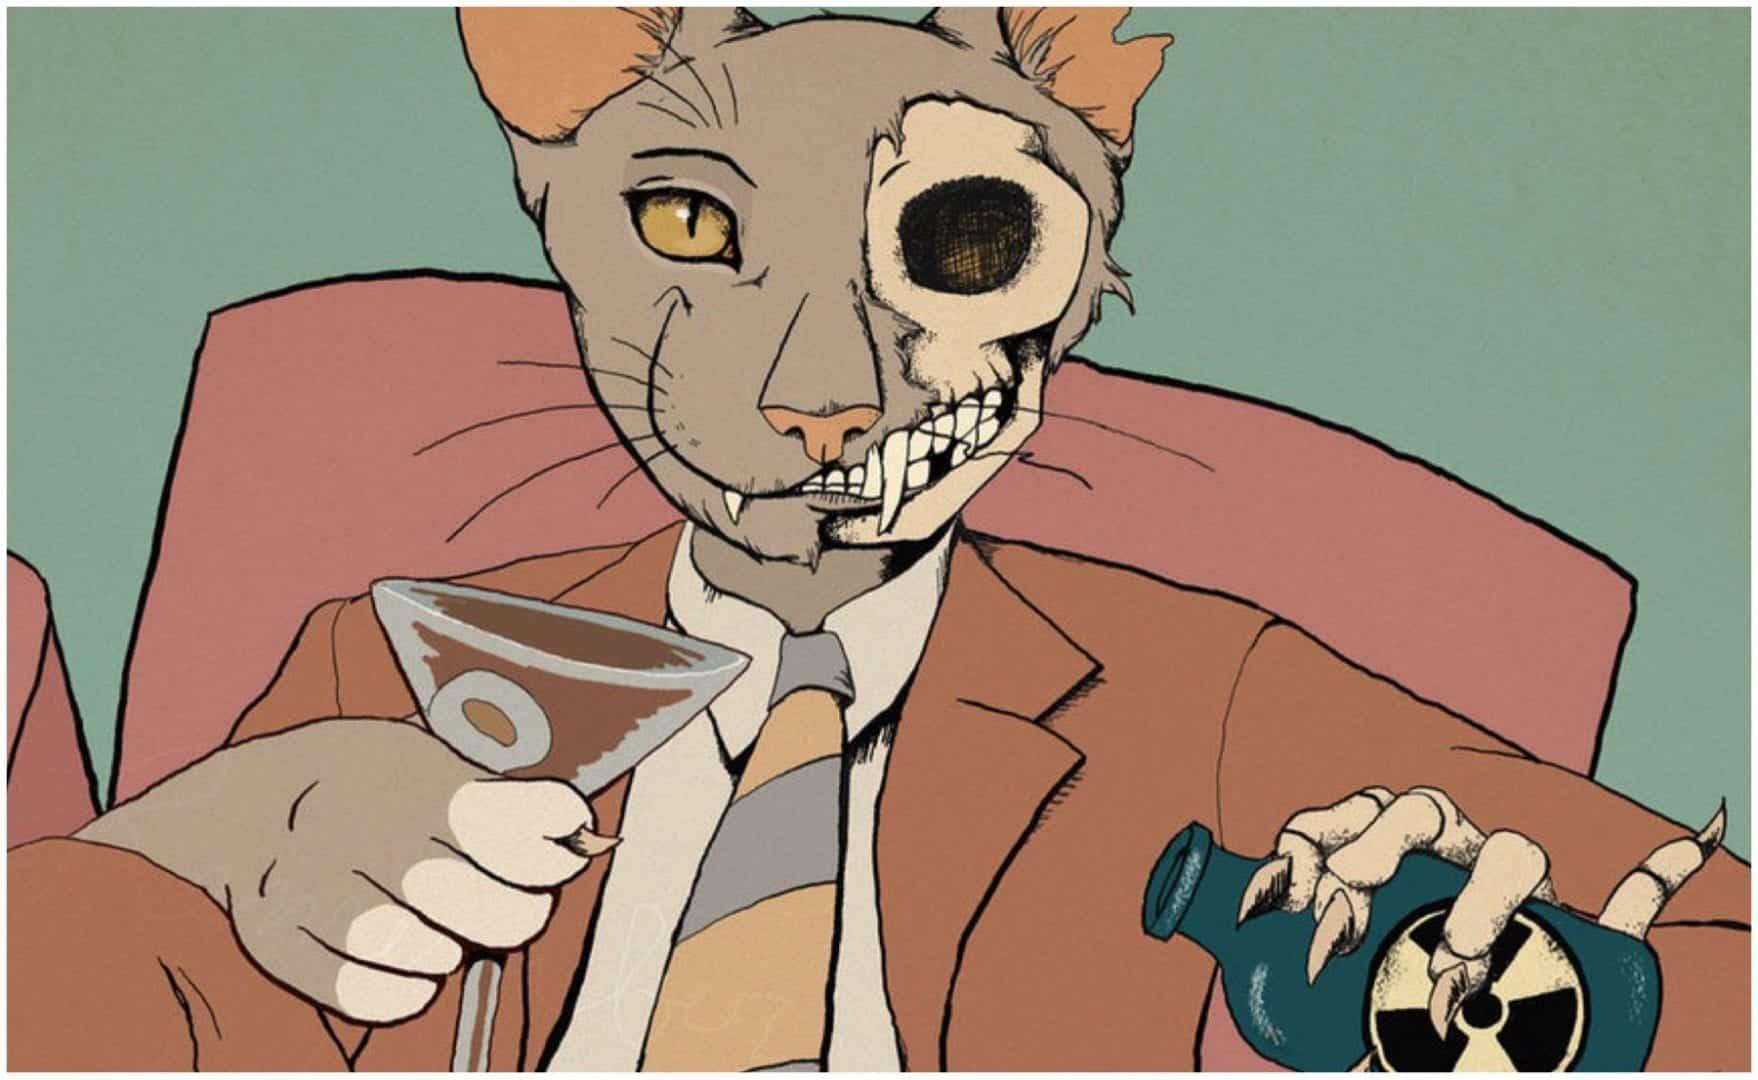 Gato de Schrödinger - O que é o experimento e como o gato foi salvo pela Ciência